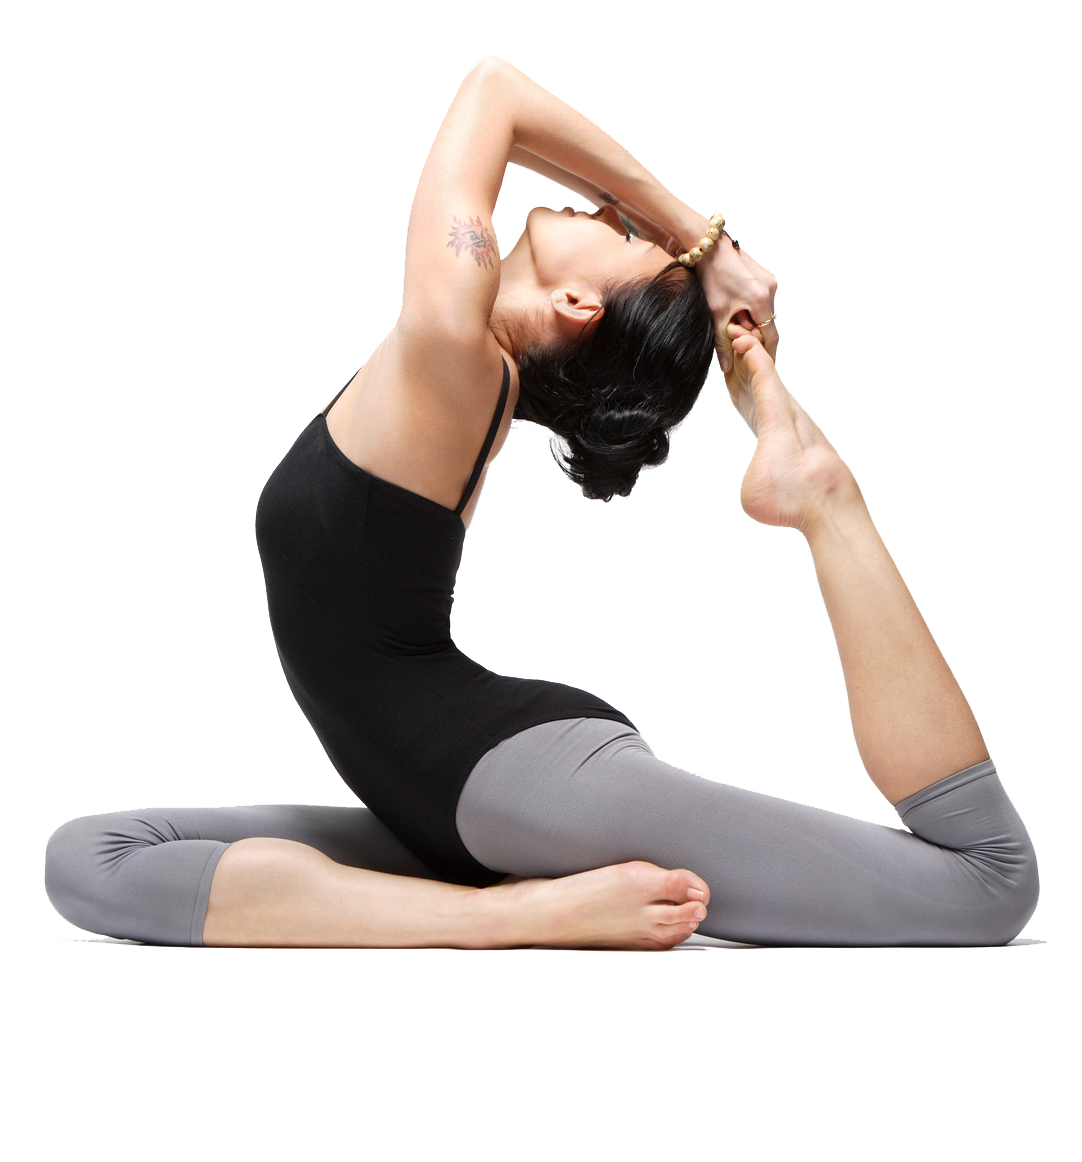 Download Pilates Yoga Mats Kapotasana Free Hd Image Hq Png Image Freepngimg